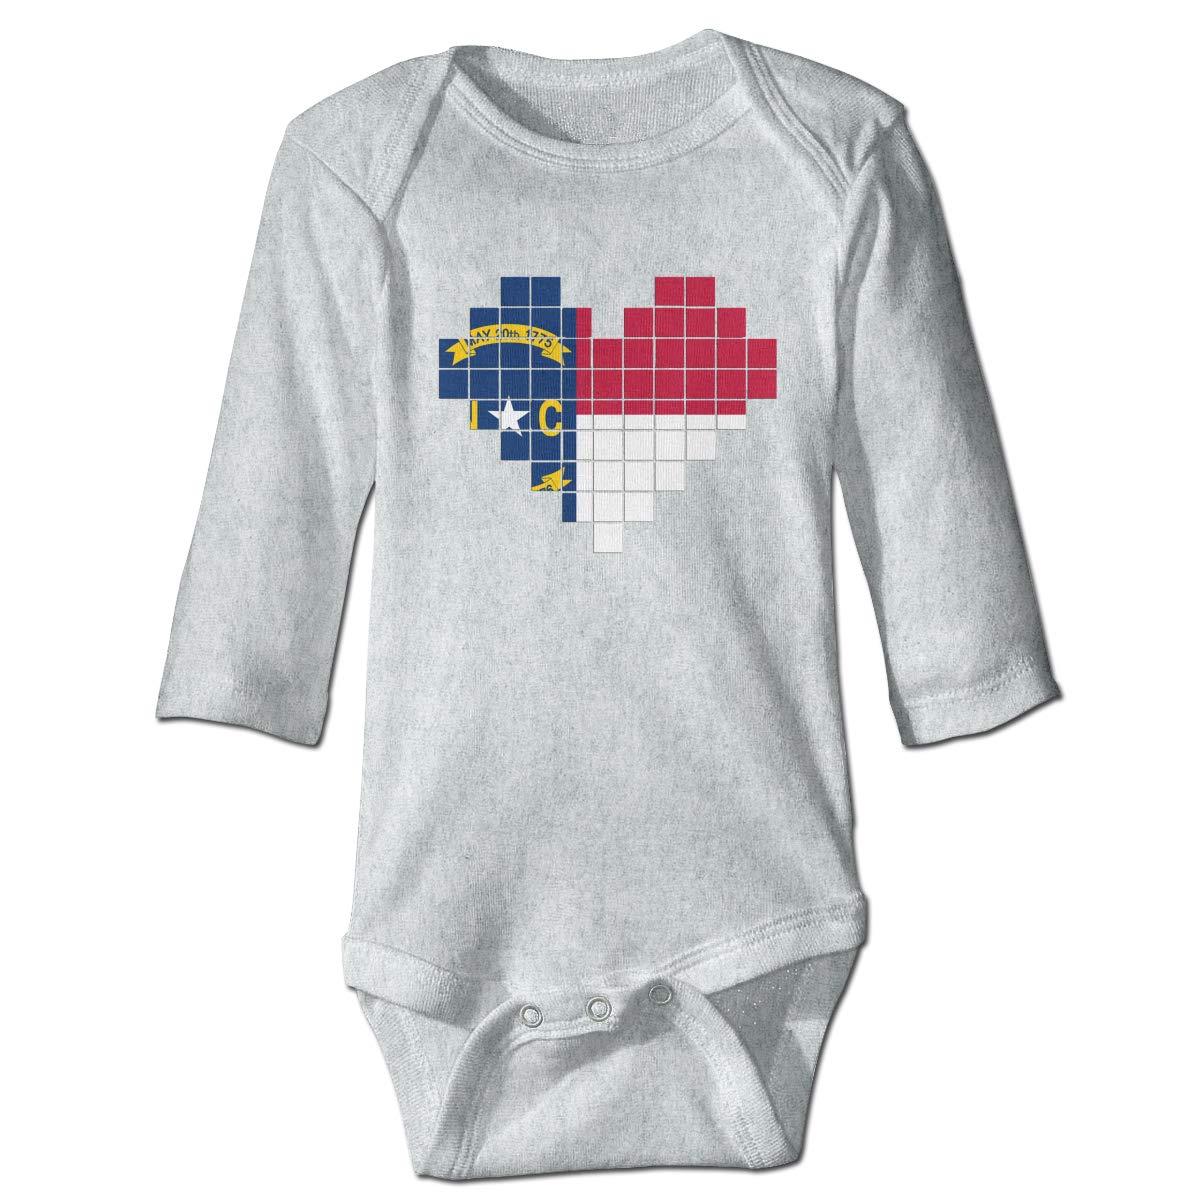 Newborn Baby Boys Girls Long Sleeve Climb Romper North Carolina Flag Playsuit Outfit Clothes